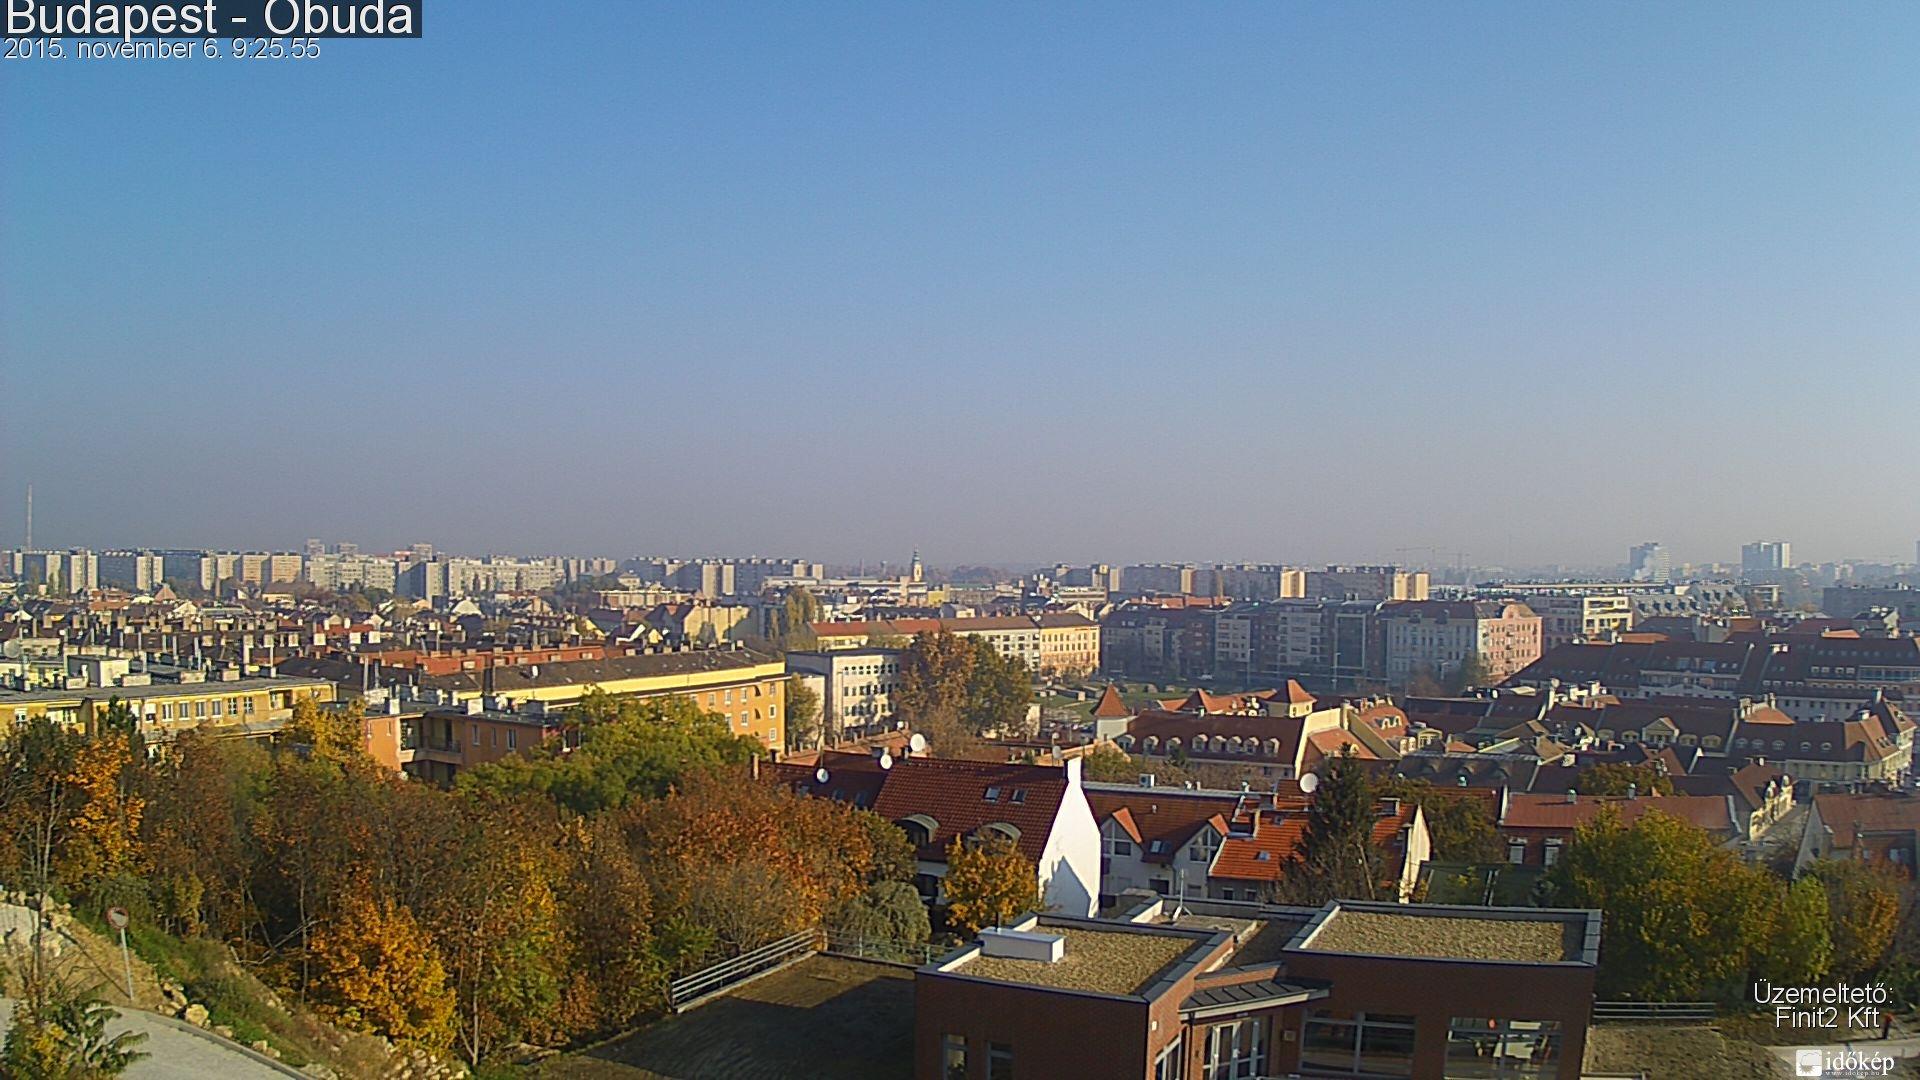 budapest_szmog.jpg